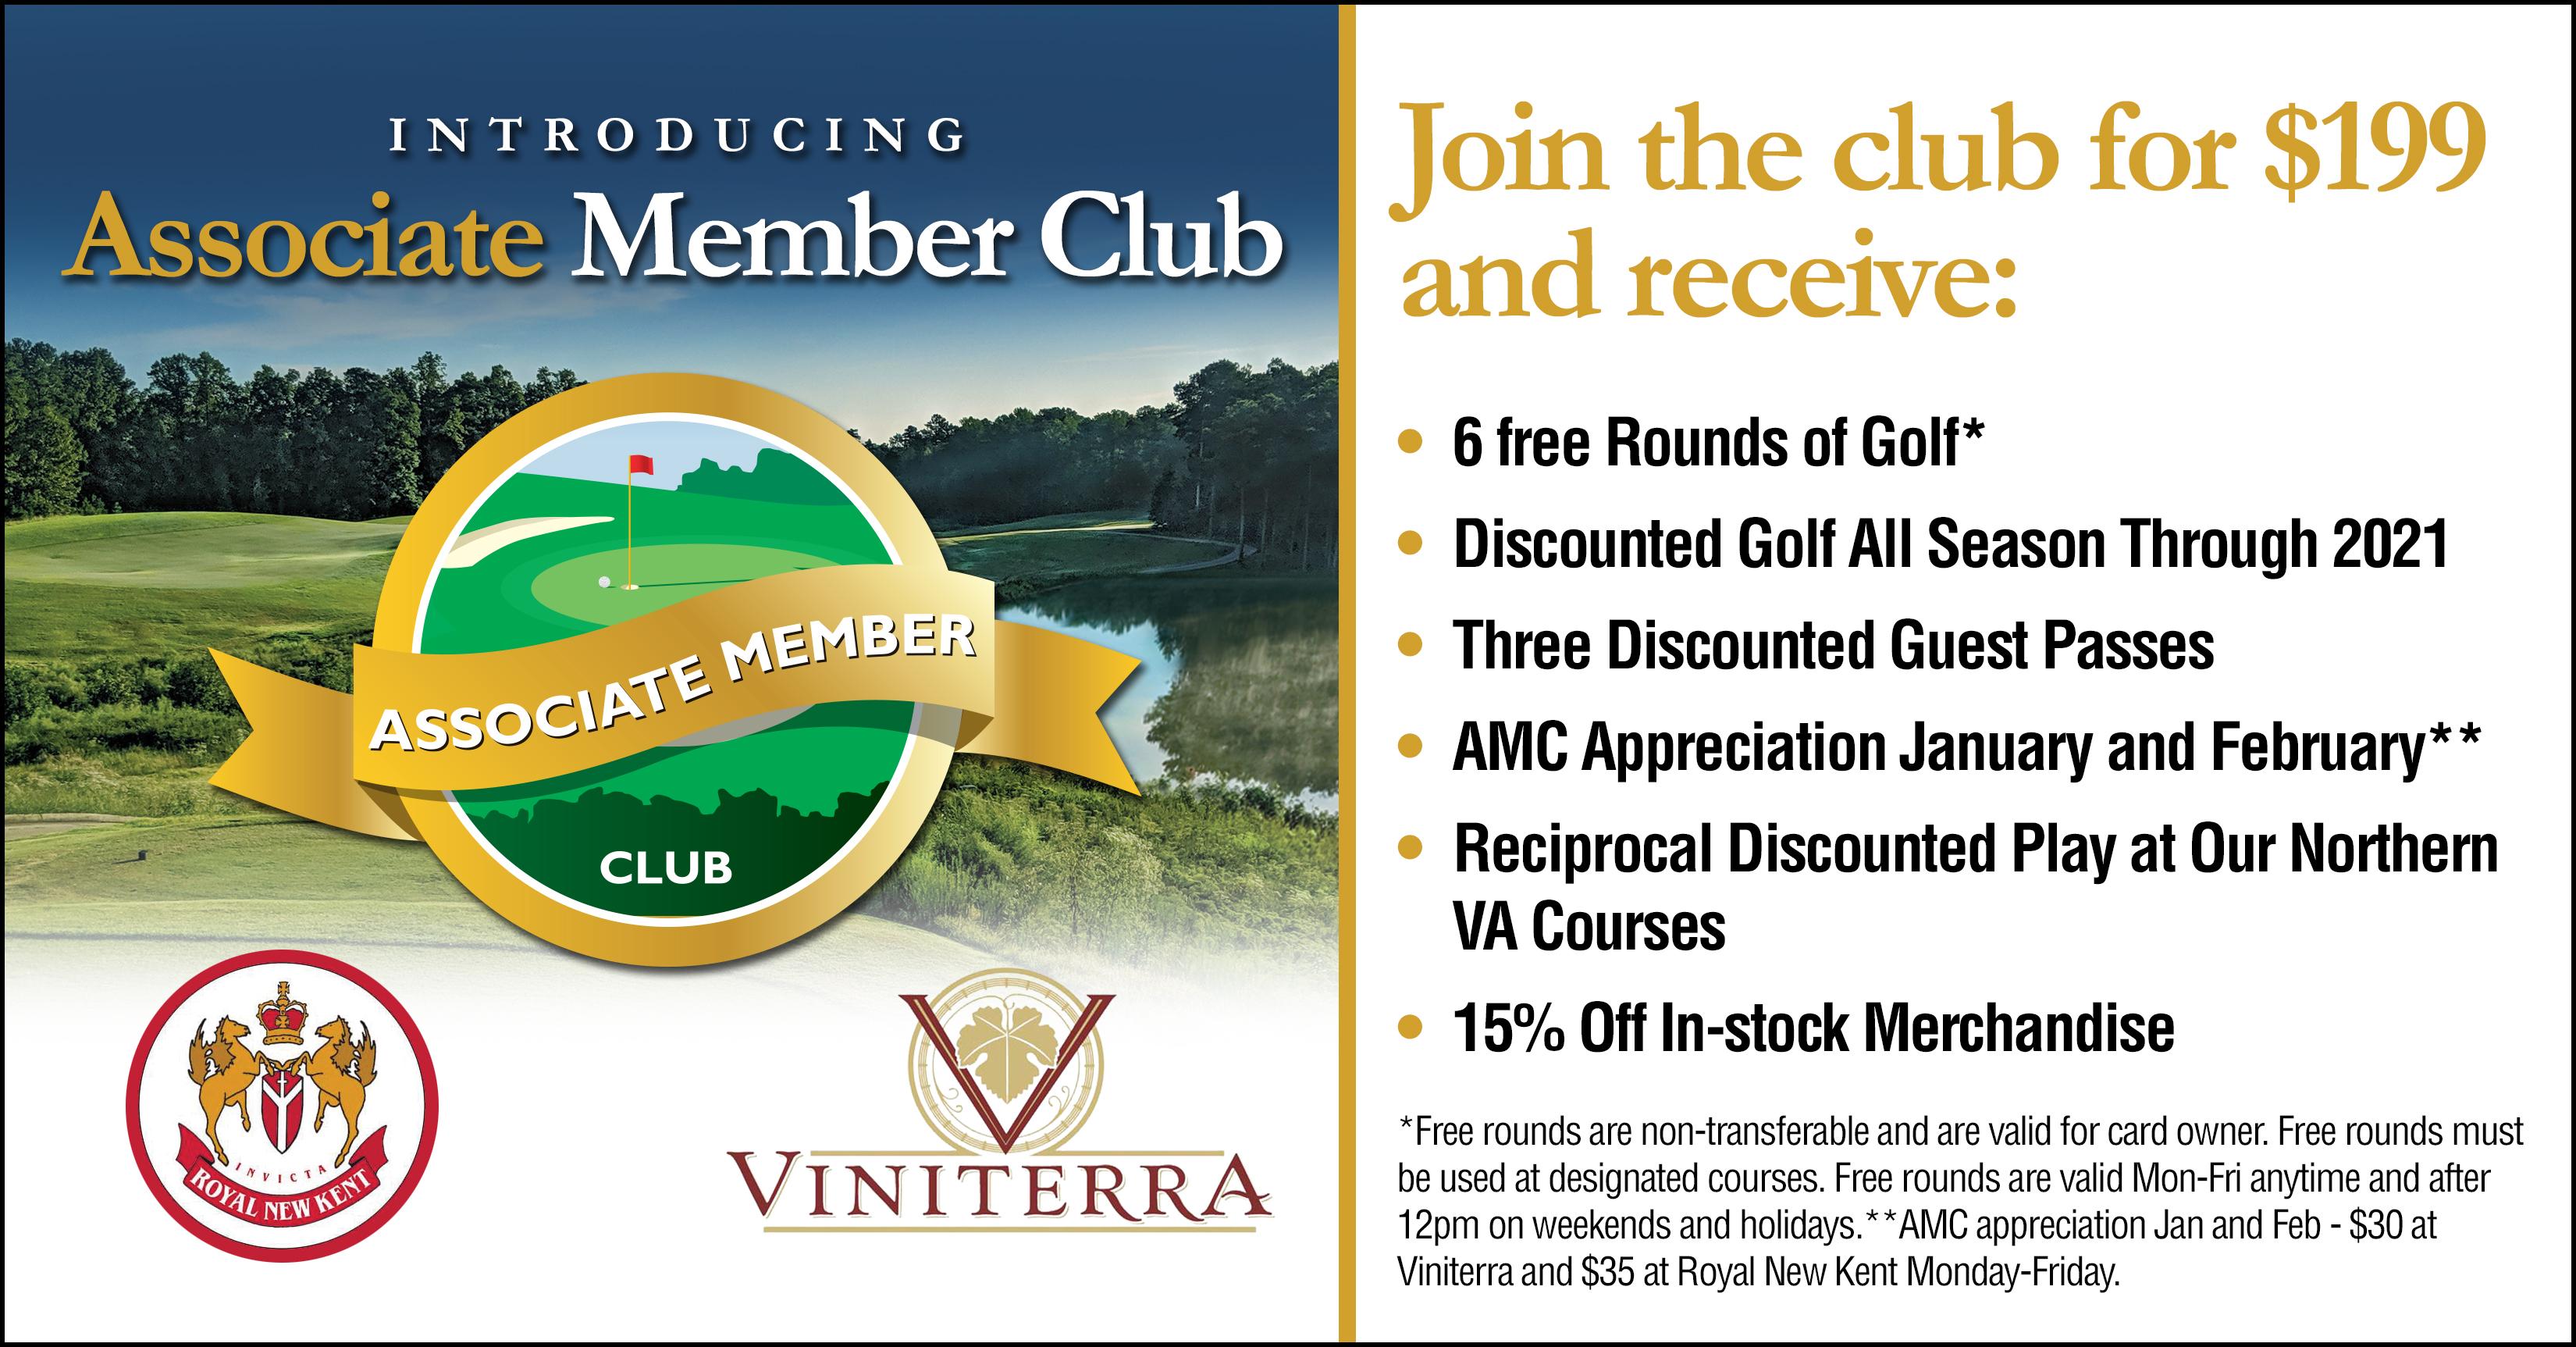 associate member club brochure